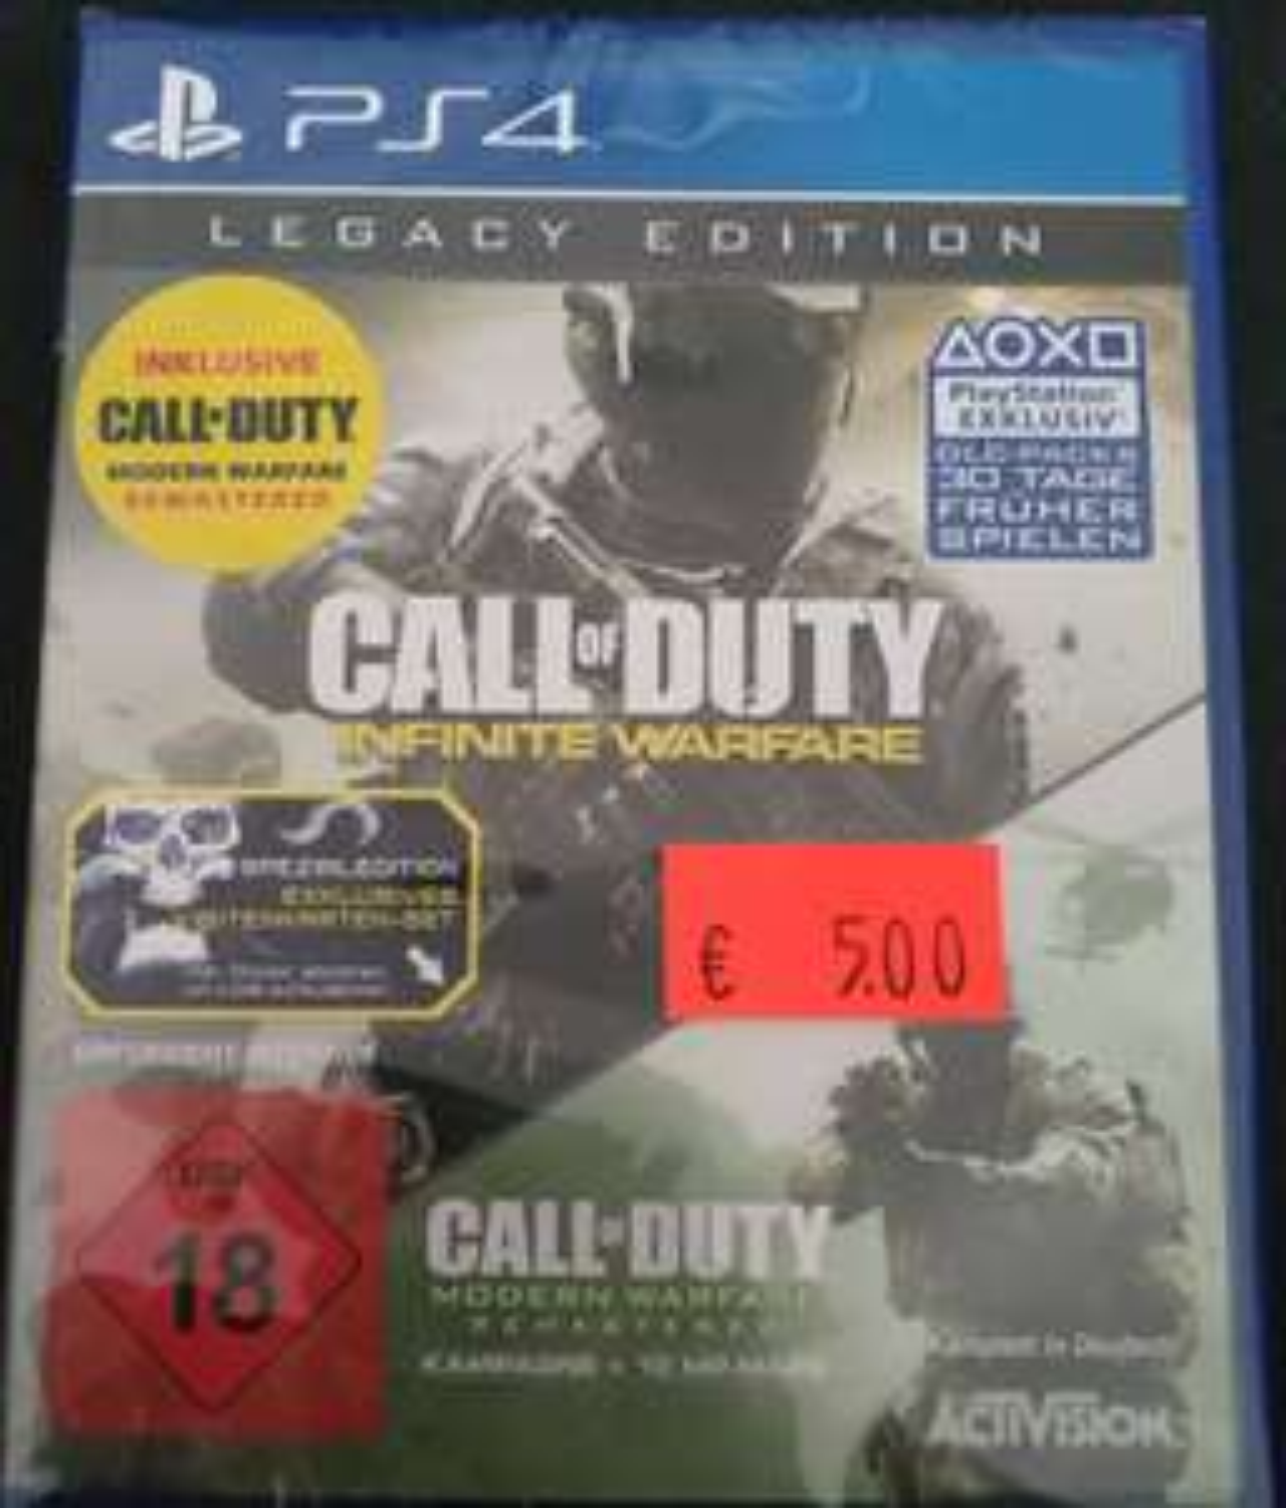 [Lokal Saturn Essen] Doppelpack Call of Duty Infinite Warefare + Modern Warfare inkl. DLCs für die Playstation 4 PS4